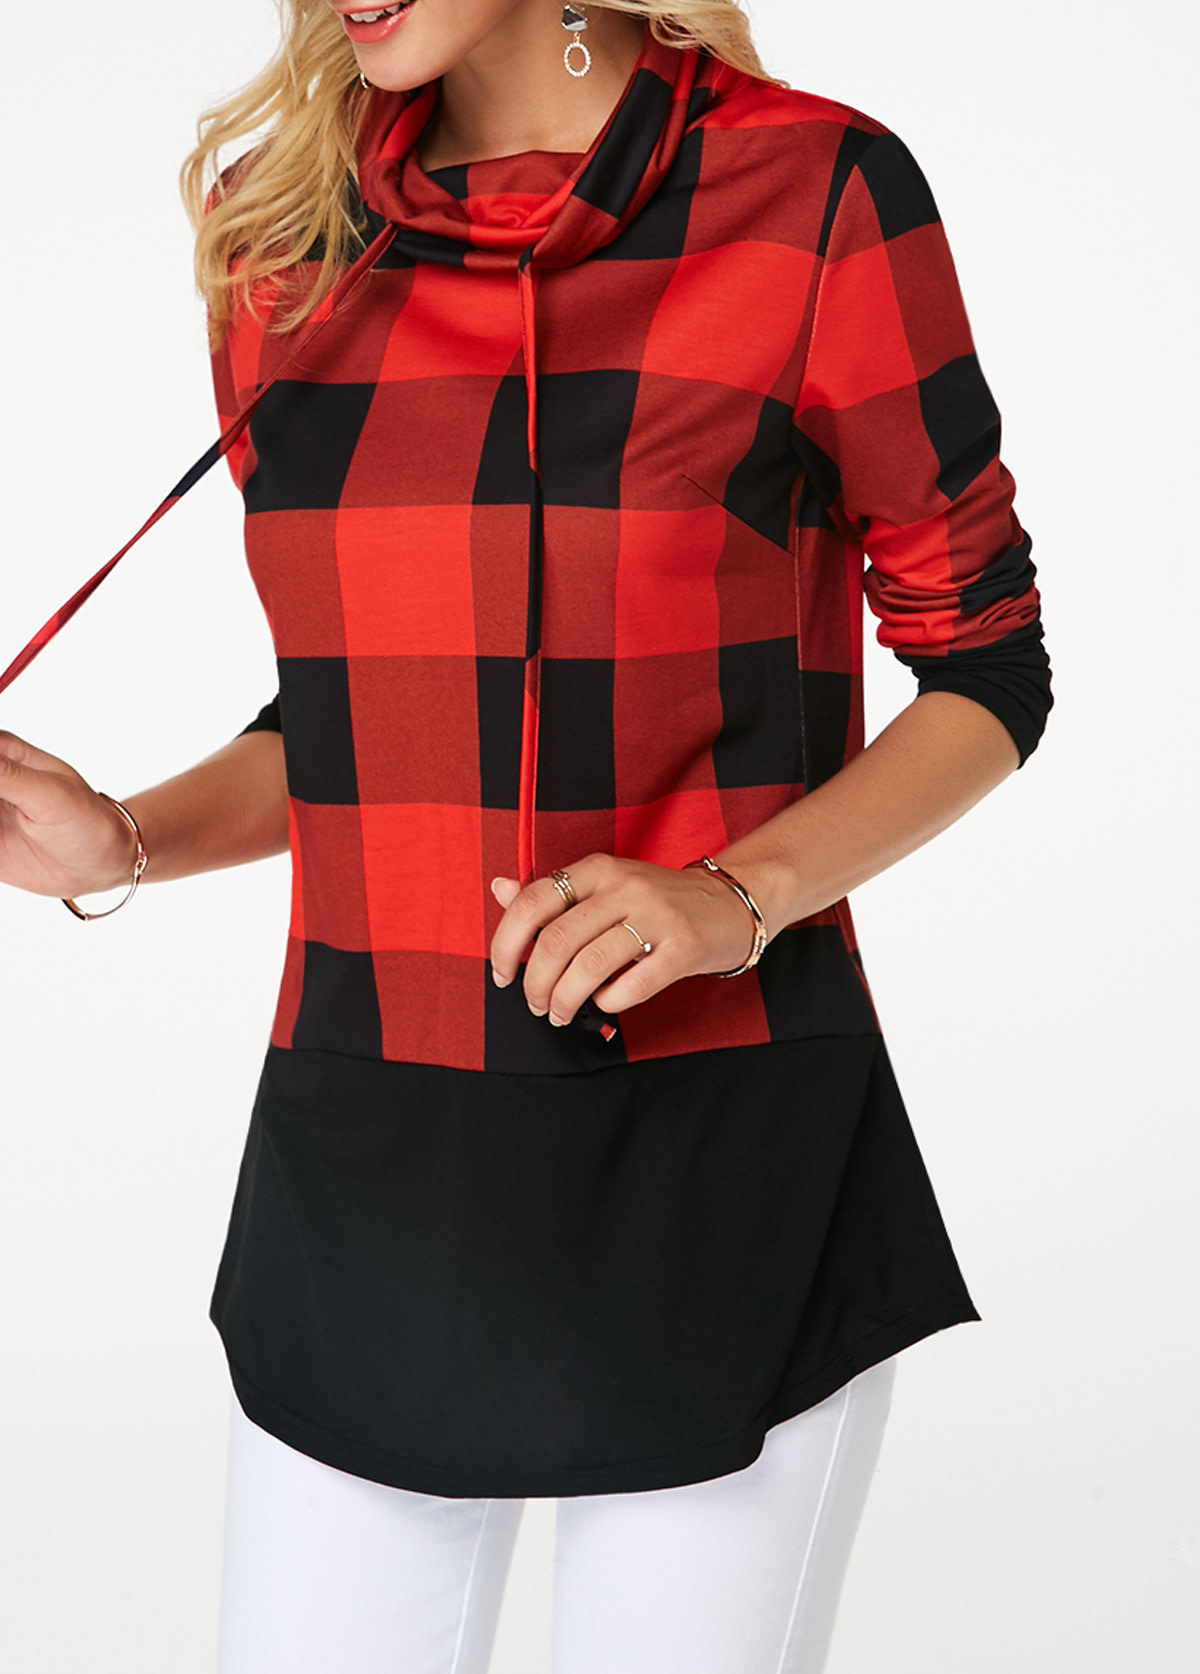 Women's Plaid Print Turtleneck Hoodie, Casual Long Sleeve Women's Plus Size Sweatshirt 6